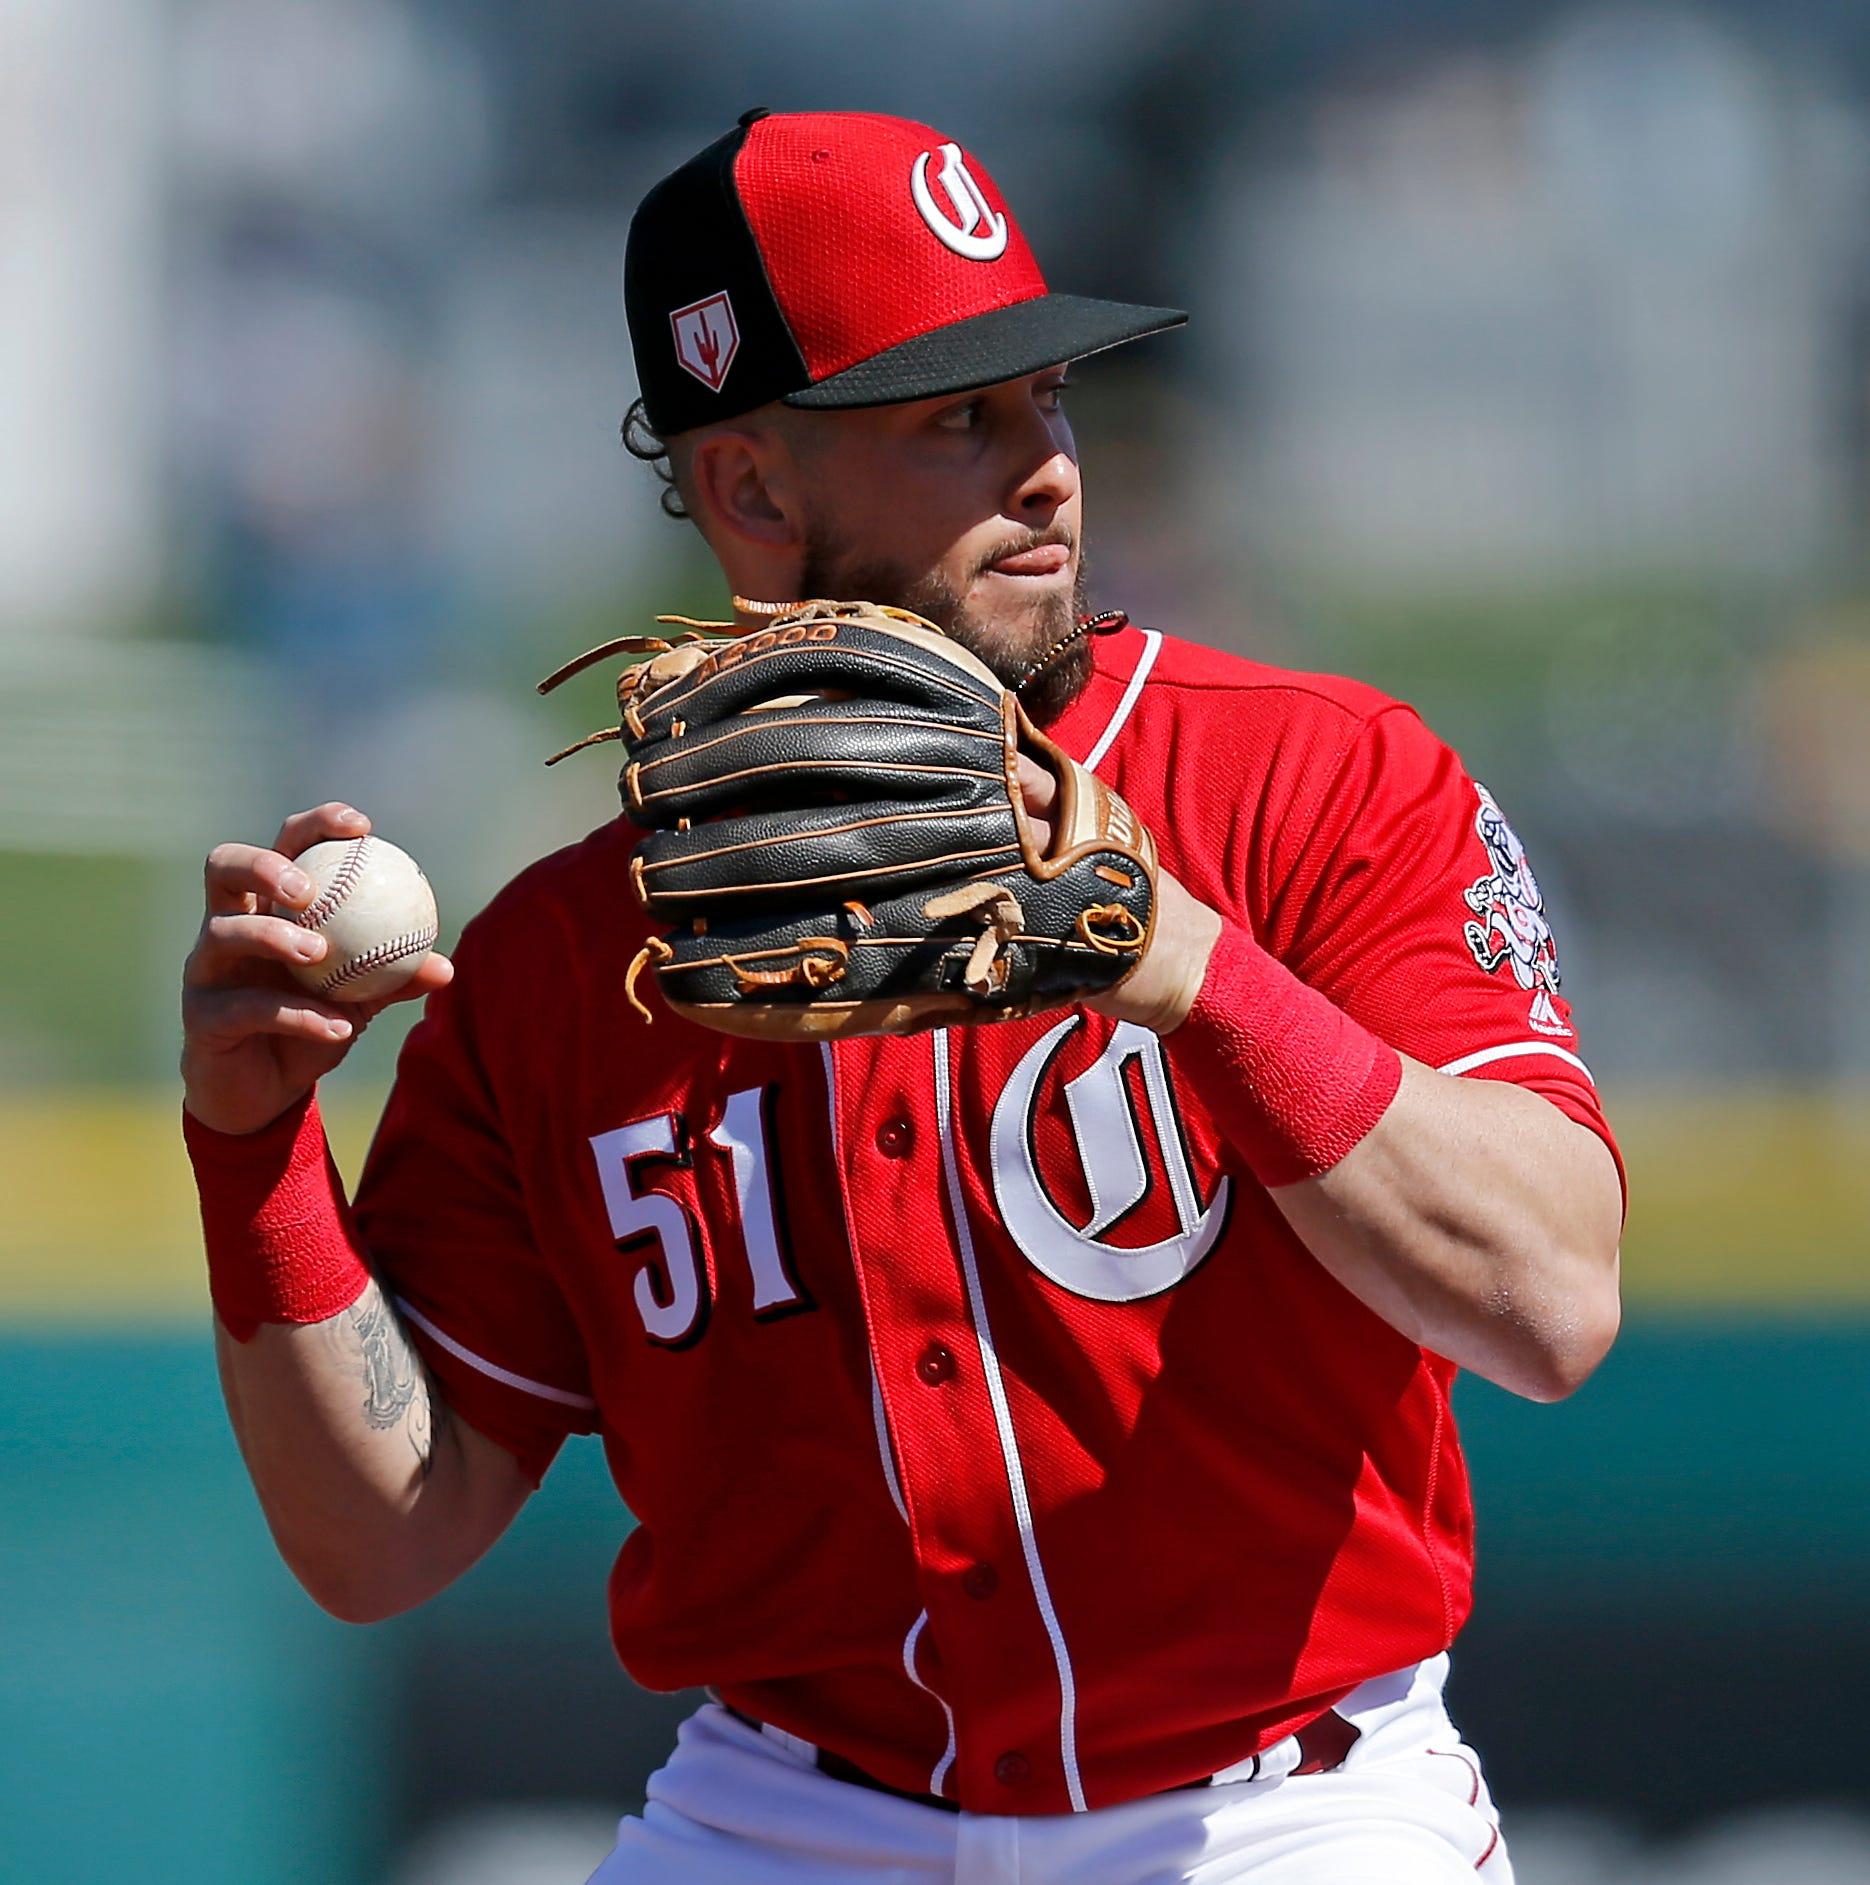 Louisville Bats' Blake Trahan receives Gold Glove trophy